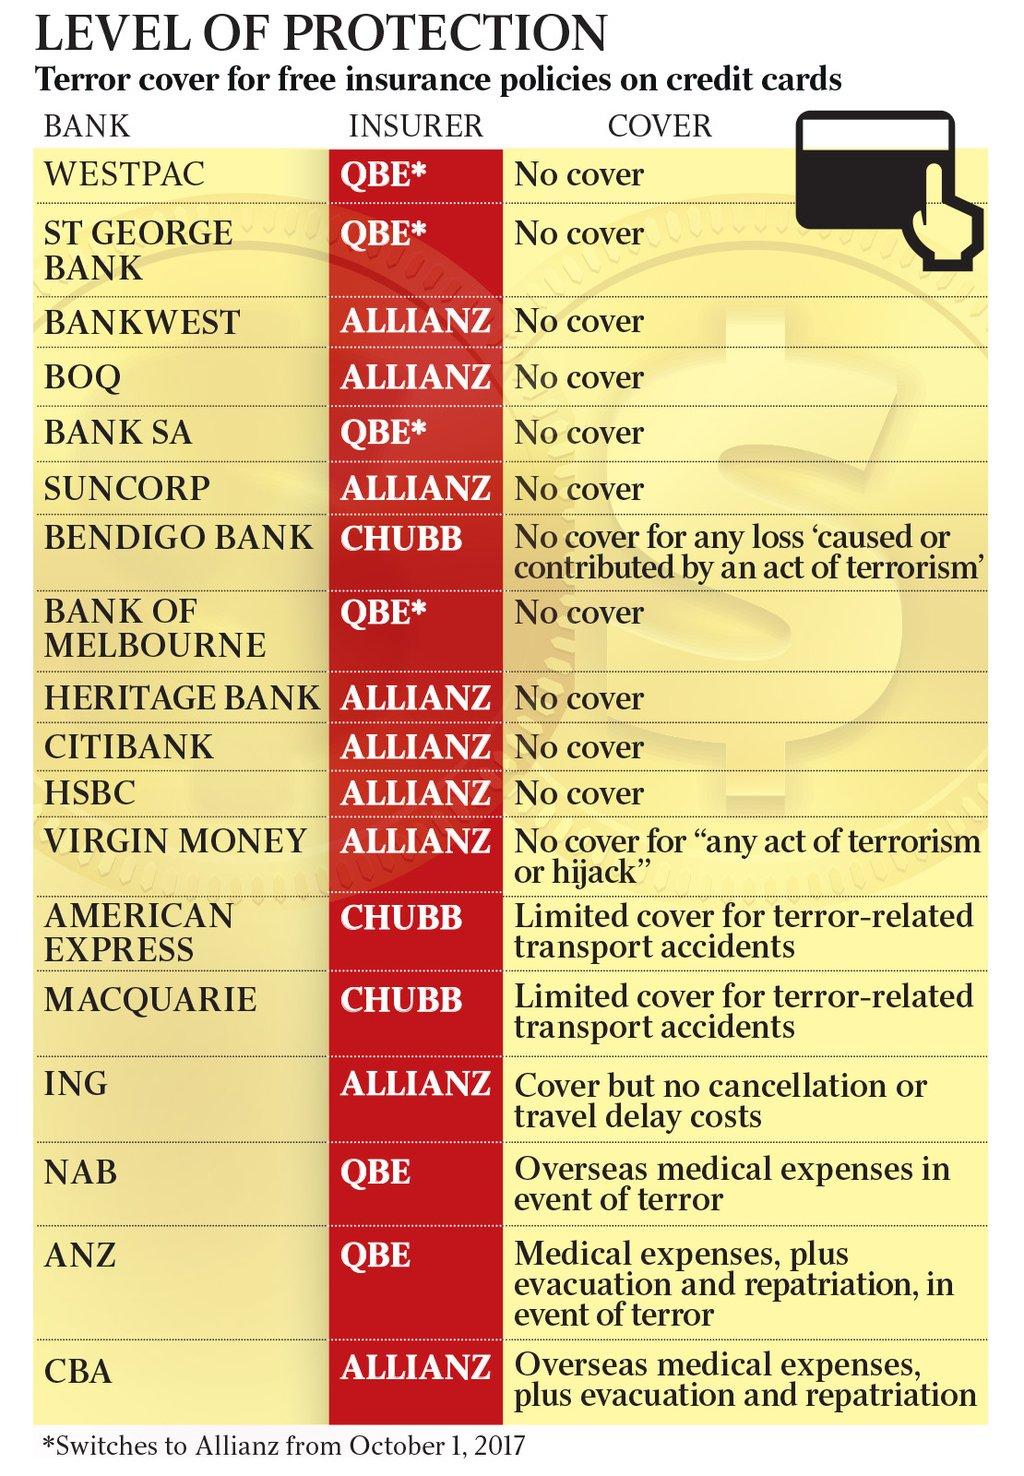 Cba Travel Insurance Terrorism